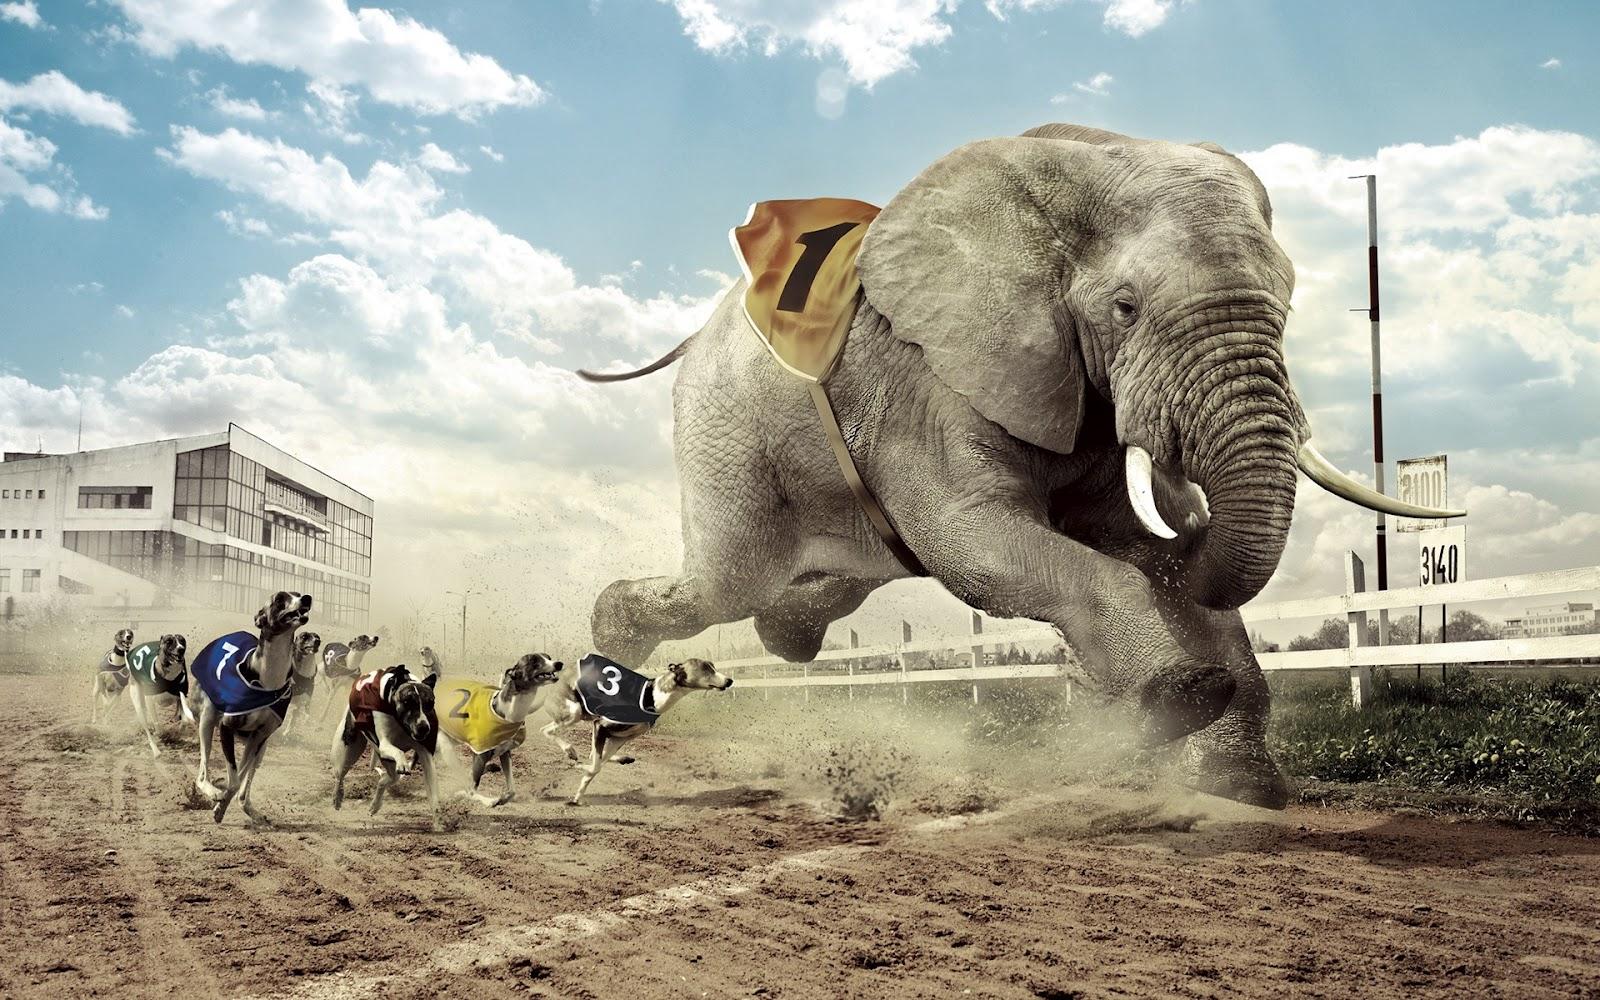 http://3.bp.blogspot.com/-jesezgrsnmM/UFsUC0WWizI/AAAAAAAAEqE/vst4ixX864w/s1600/Dogs-vs-Elephant-Racing-Photo-Manipulation-HD-Wallpaper-NatureWallBase.Blogspot.Com.jpg